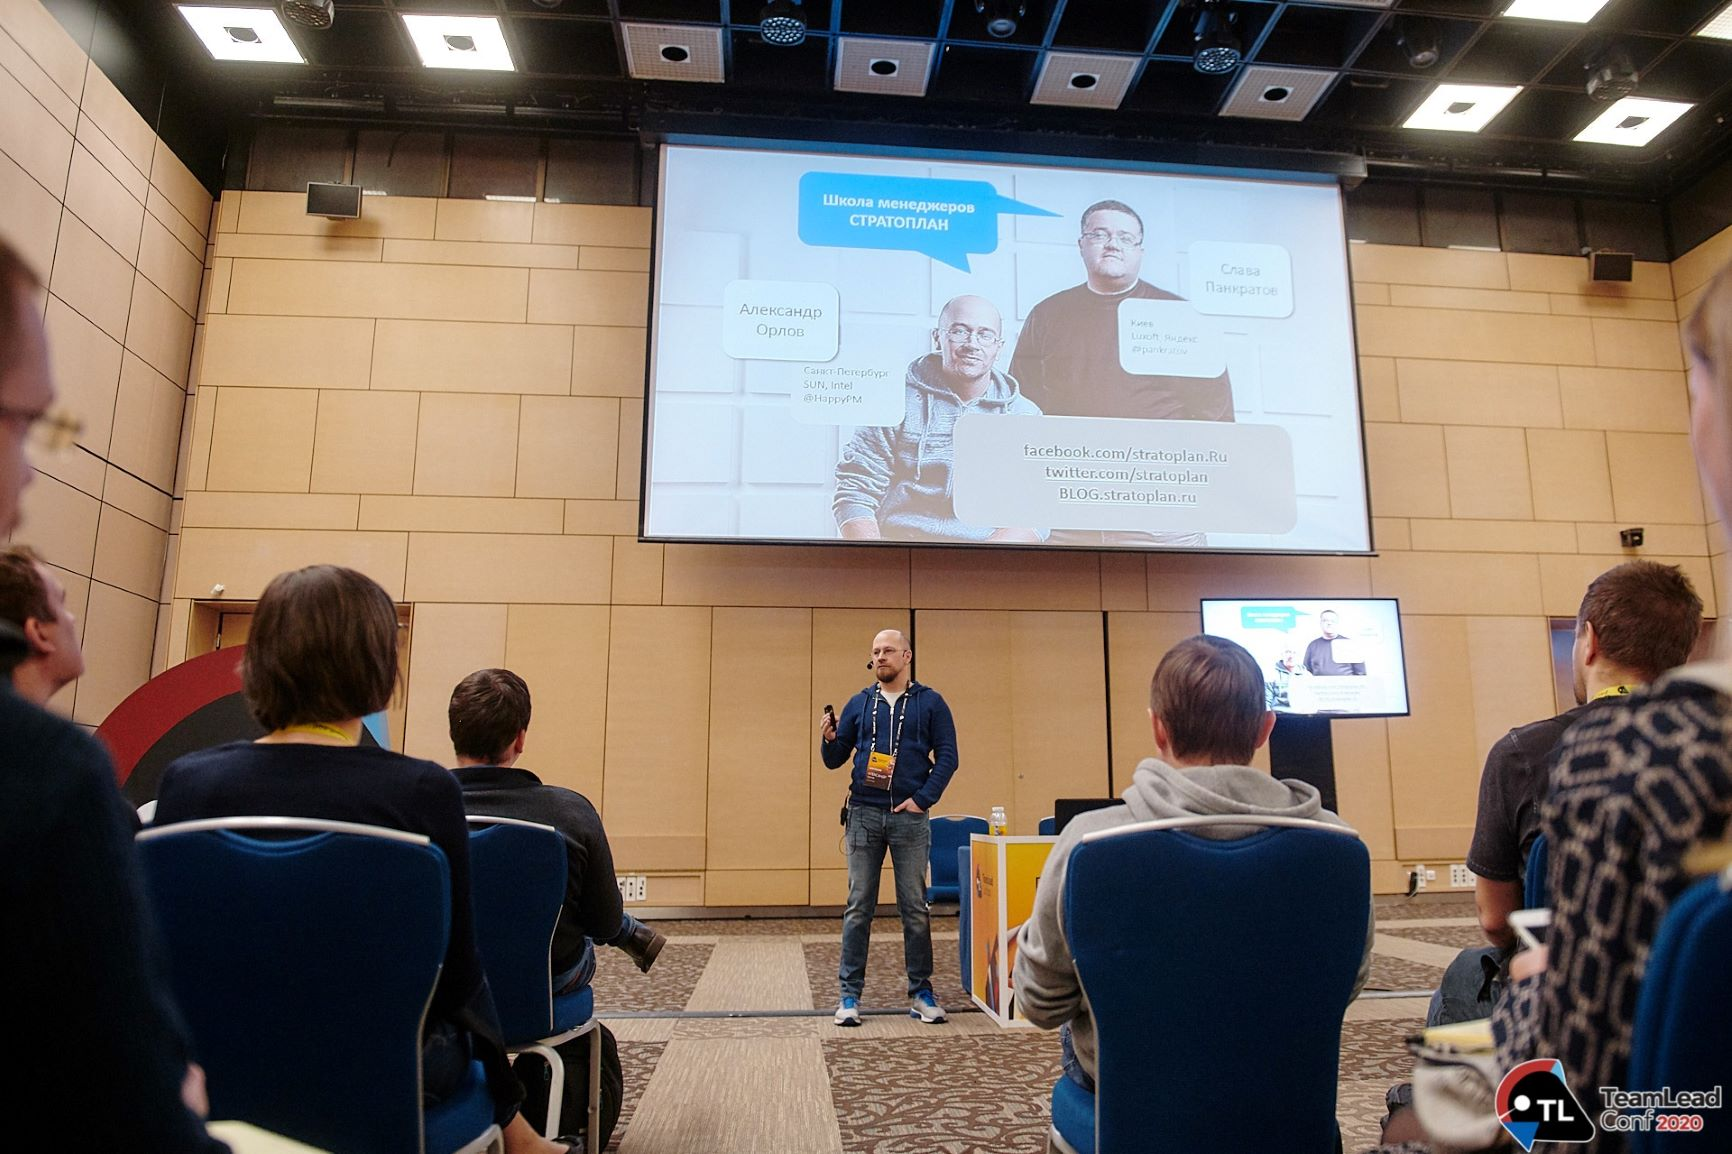 «Больше интерактива!» или Как прошел TeamLead Conf 2020 - 4